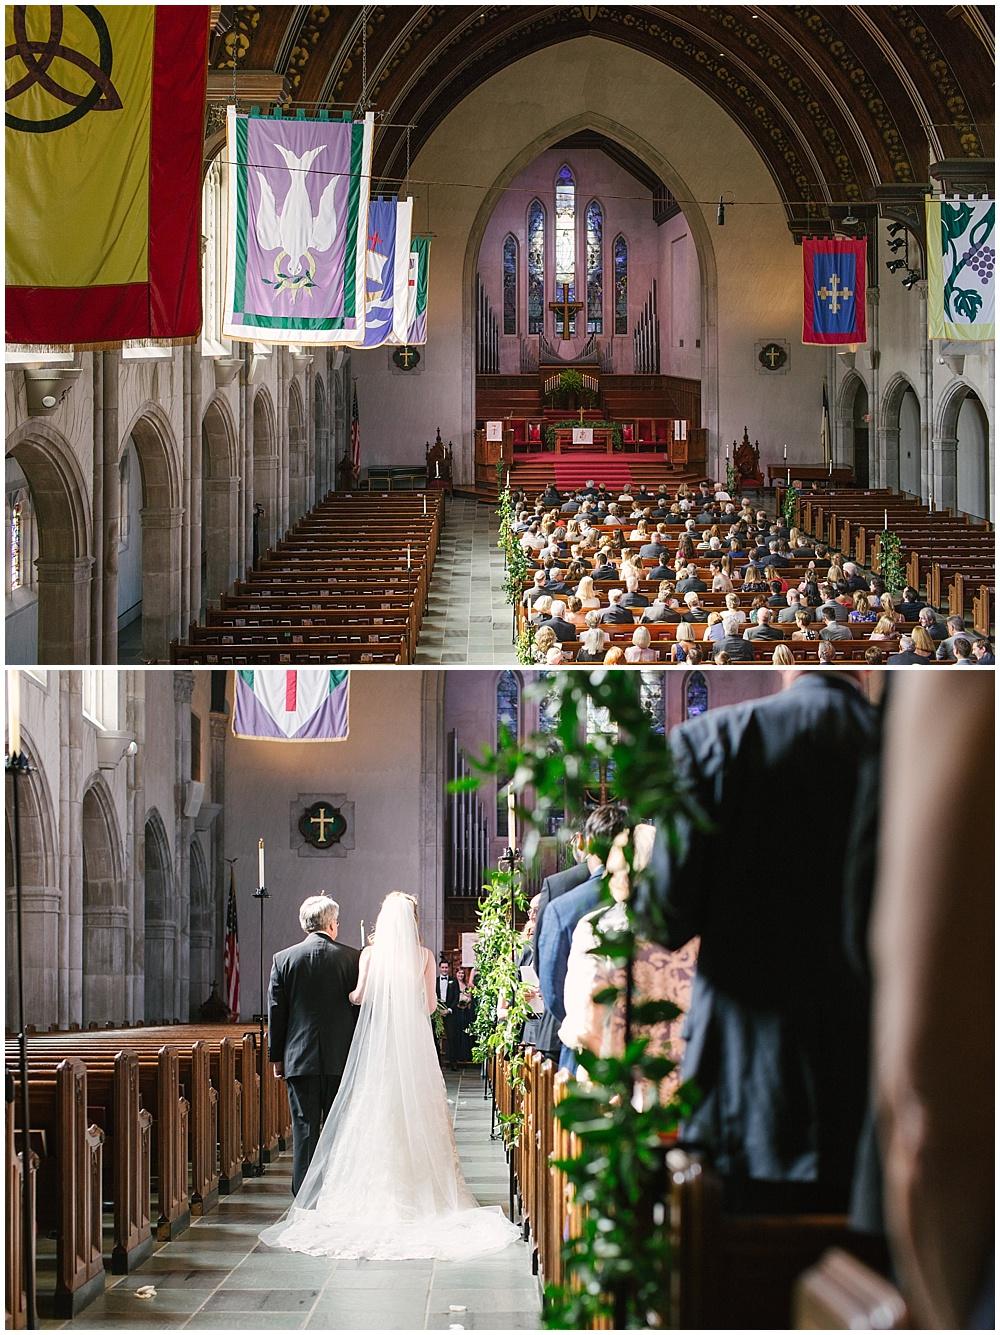 Second Presbyterian Church; Navy + blush wedding; Scottish Rite Cathedral| Traci & Troy Photography and Jessica Dum Wedding Coordination